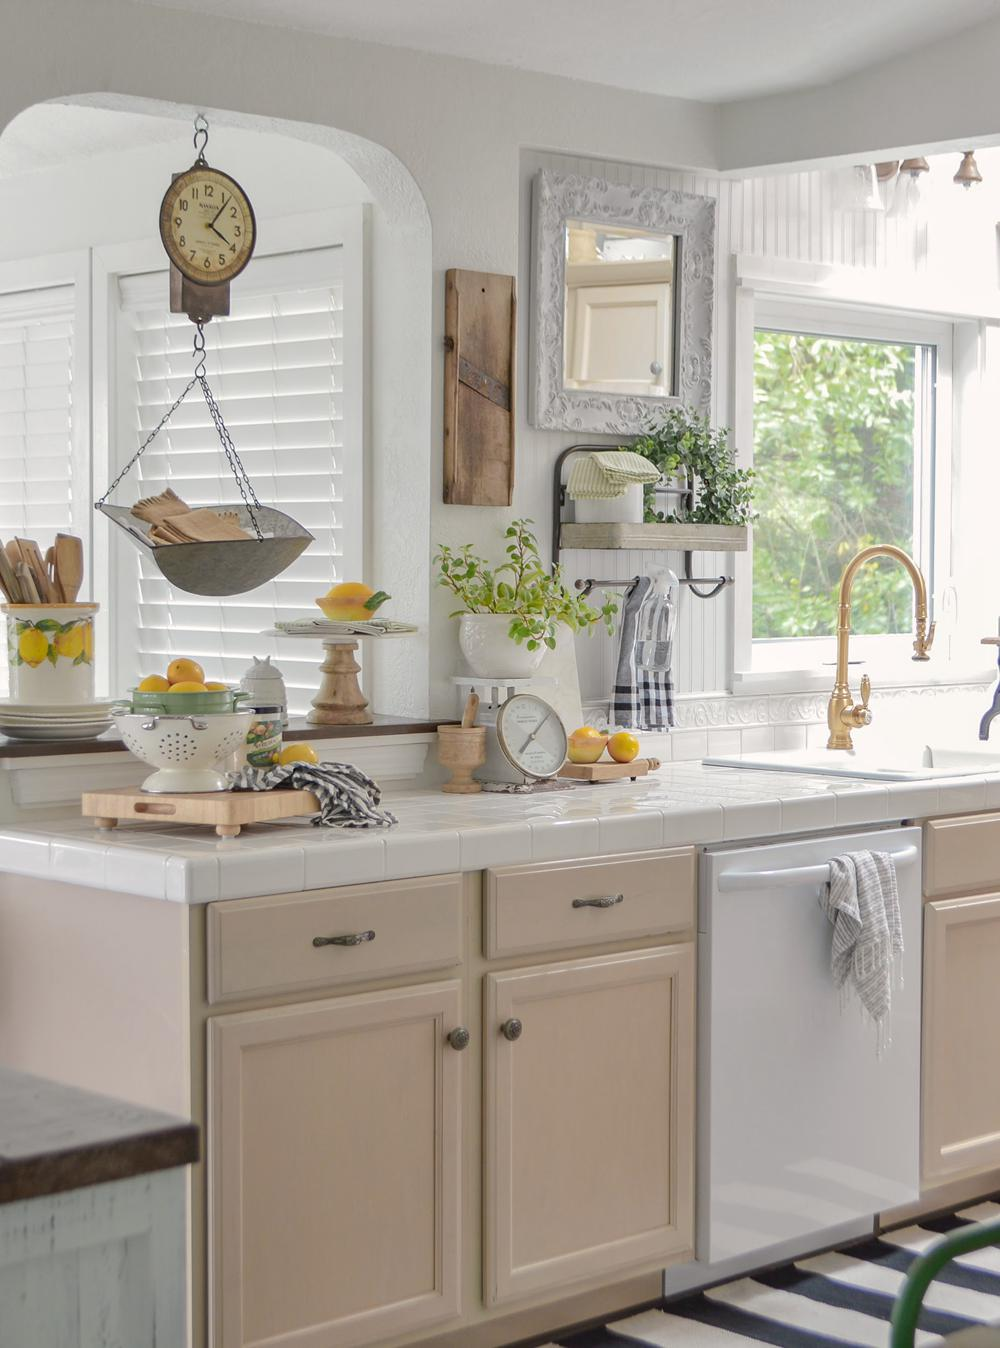 20. Easy Lemon Kitchen Decor